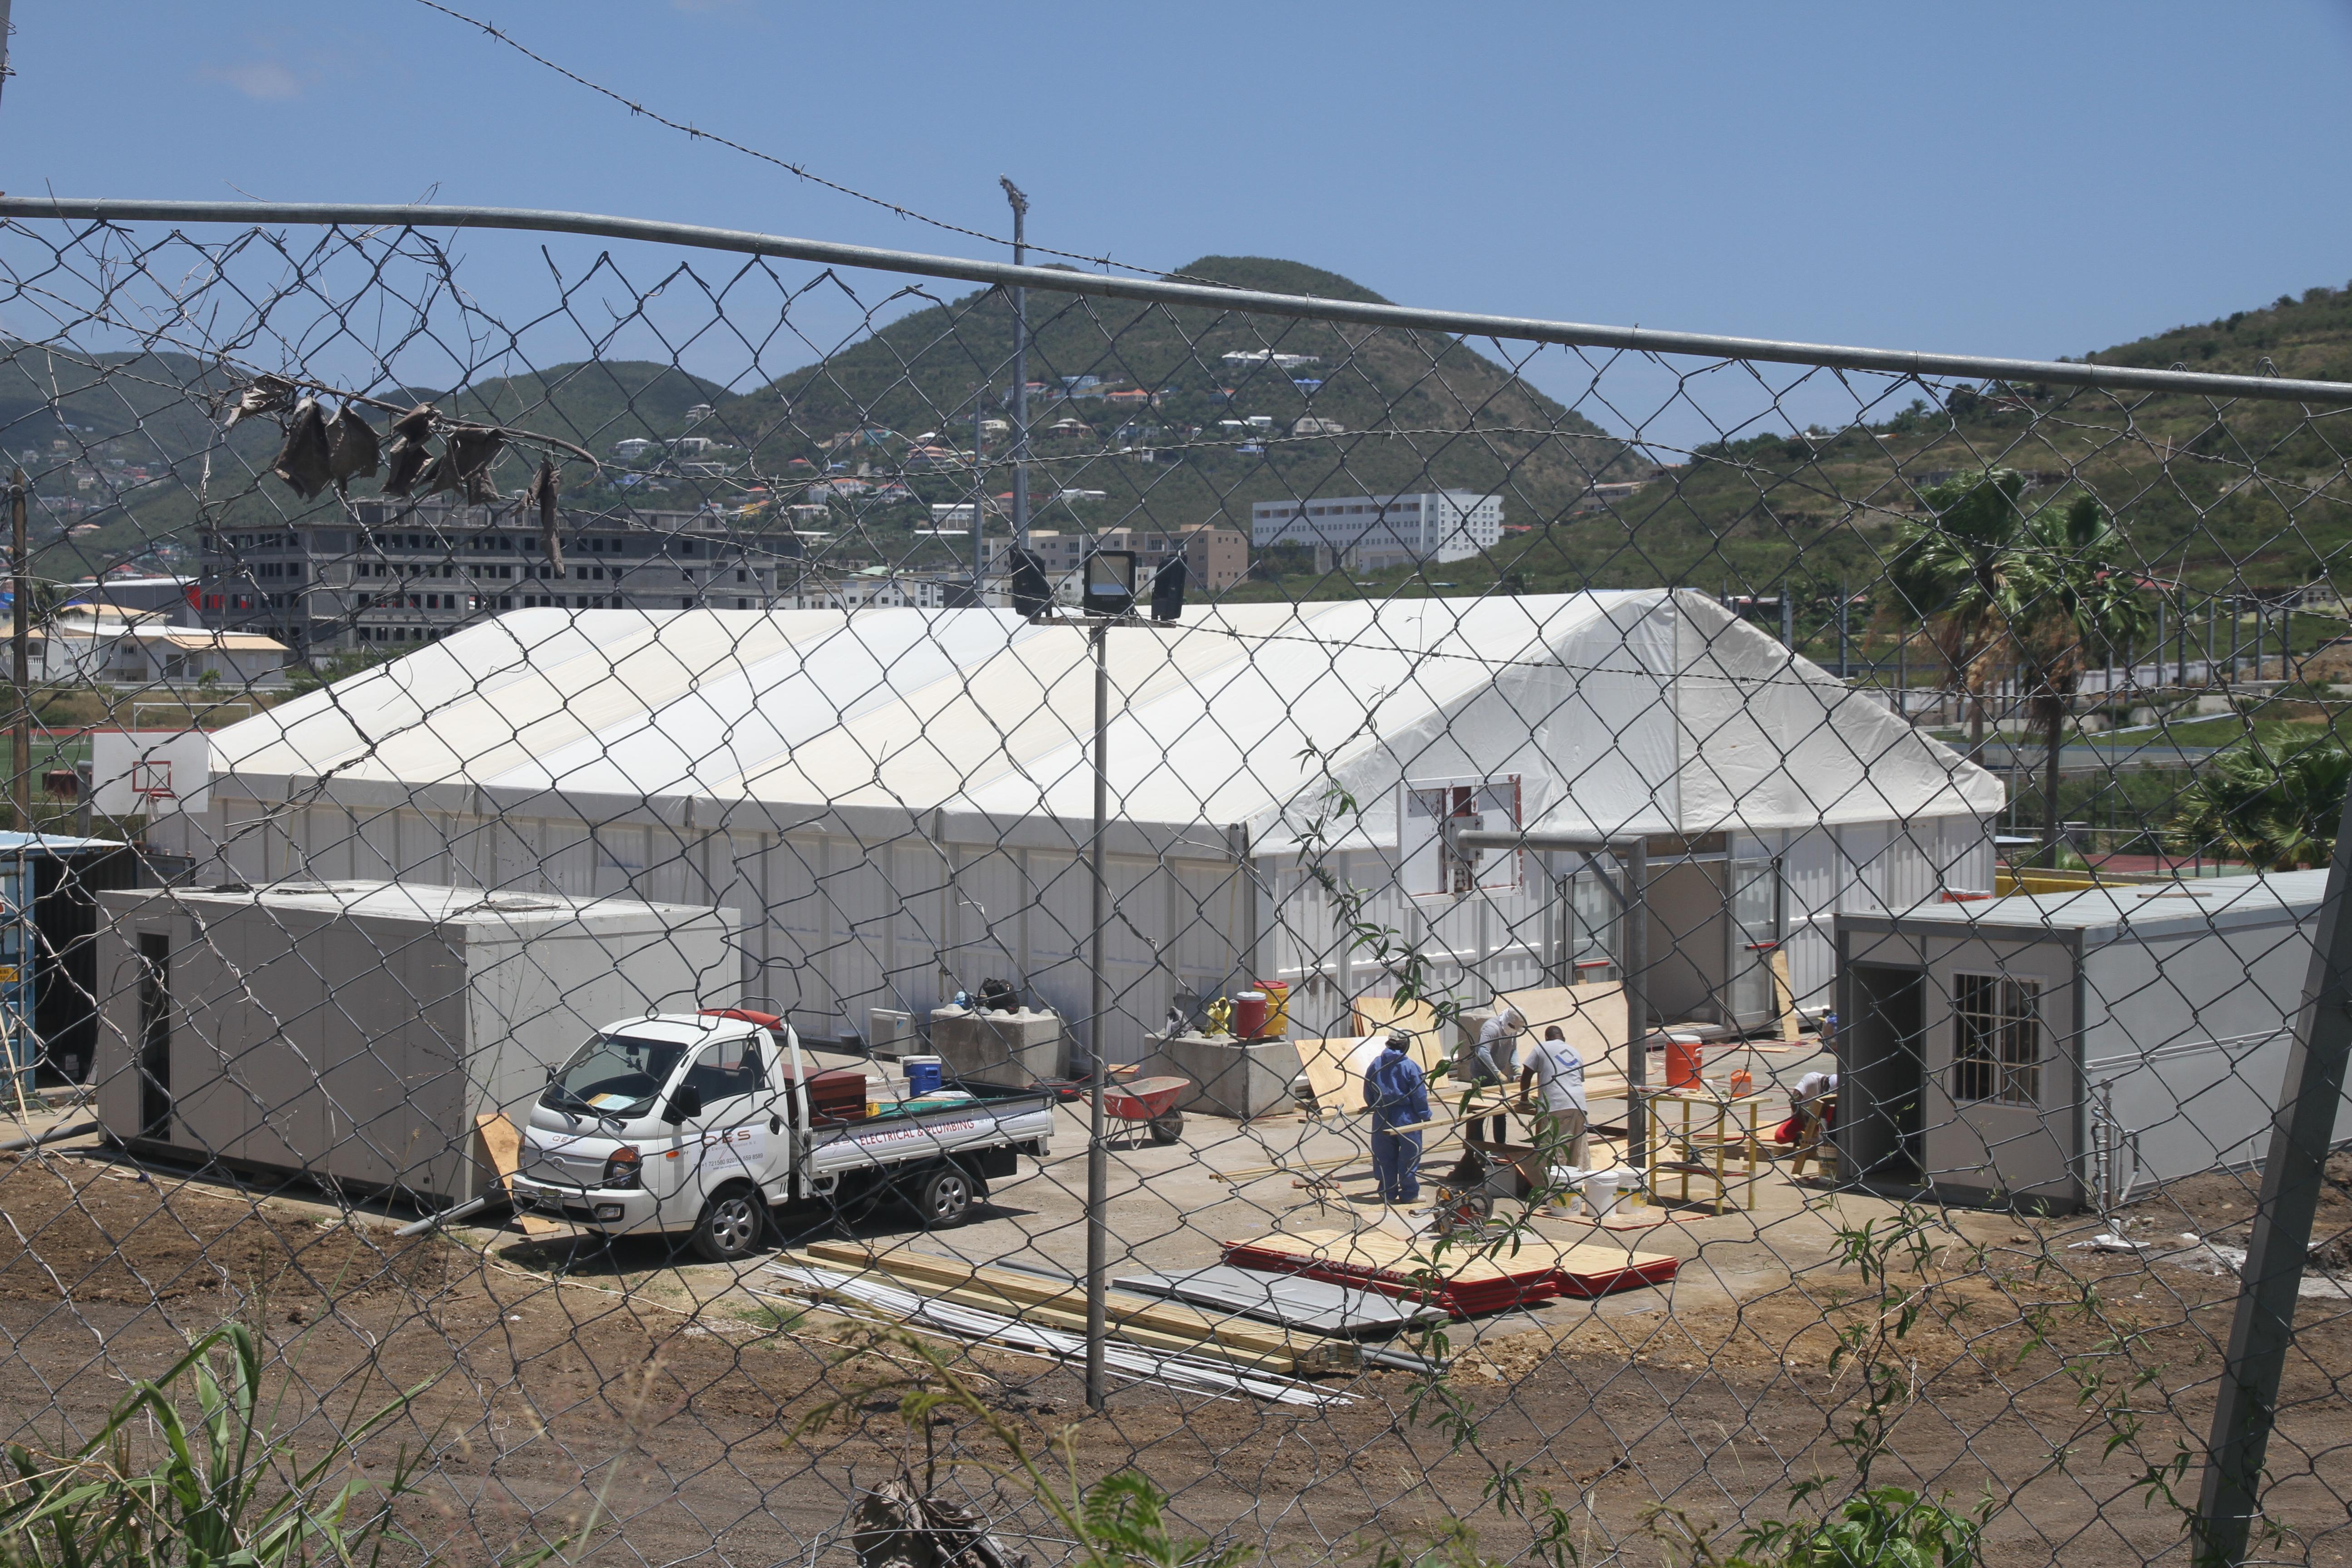 Coronavirus Update for St. Maarten/St. Martin